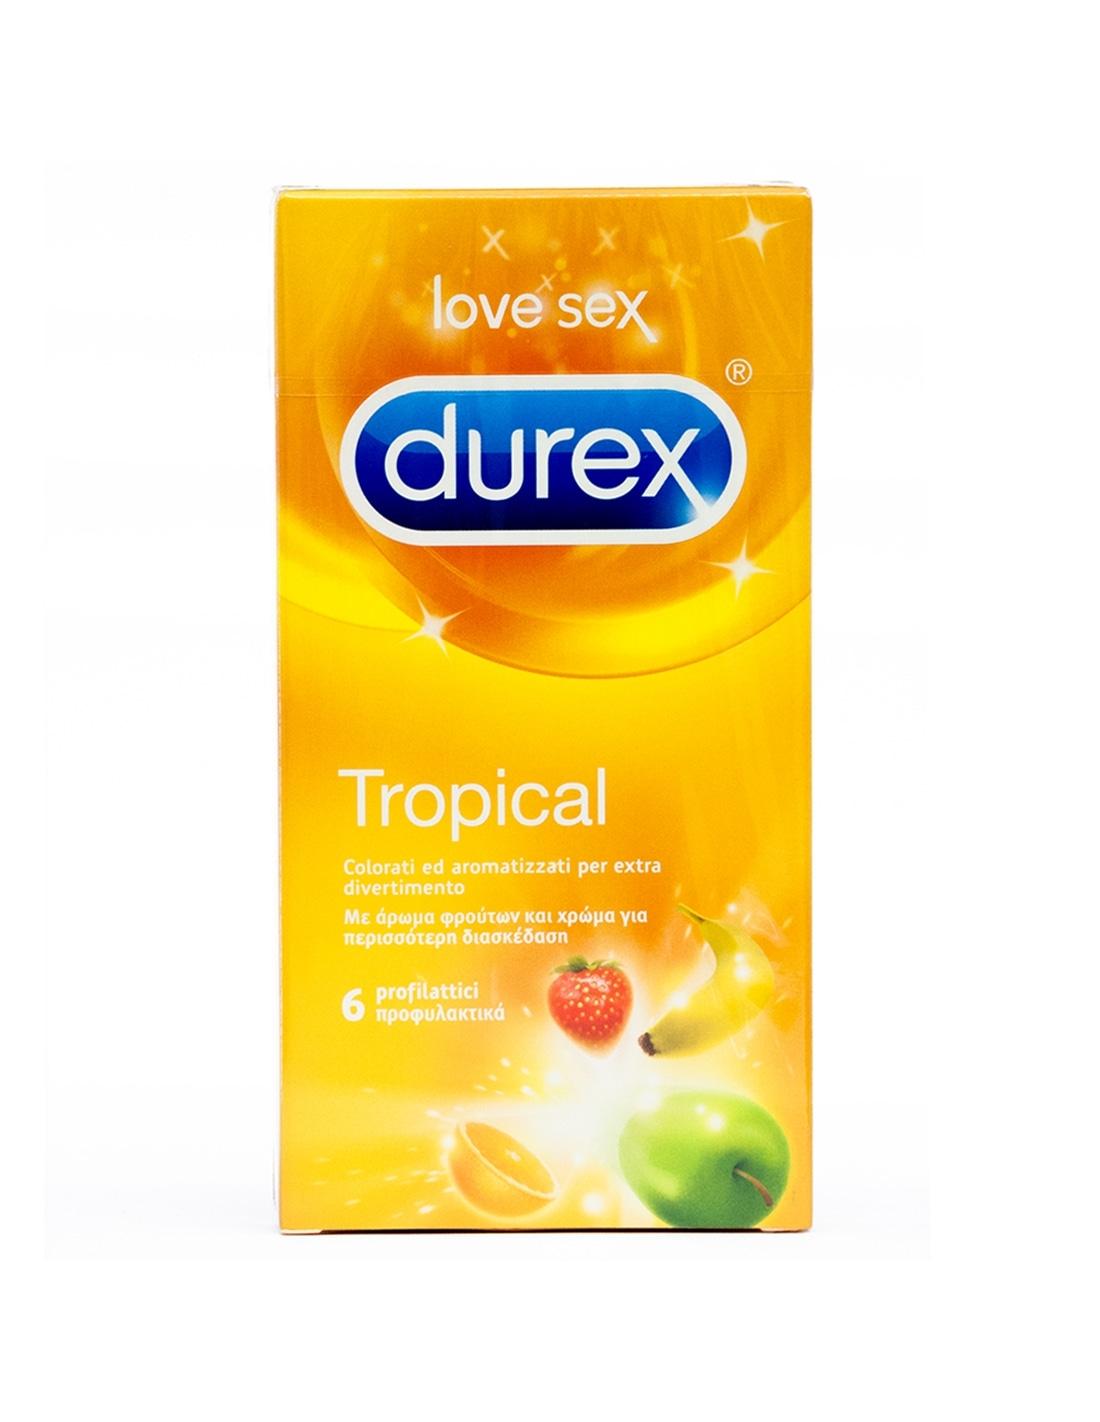 PR2010333979 - Preservativos Durex Tropical - 6 Unidades-PR2010333979